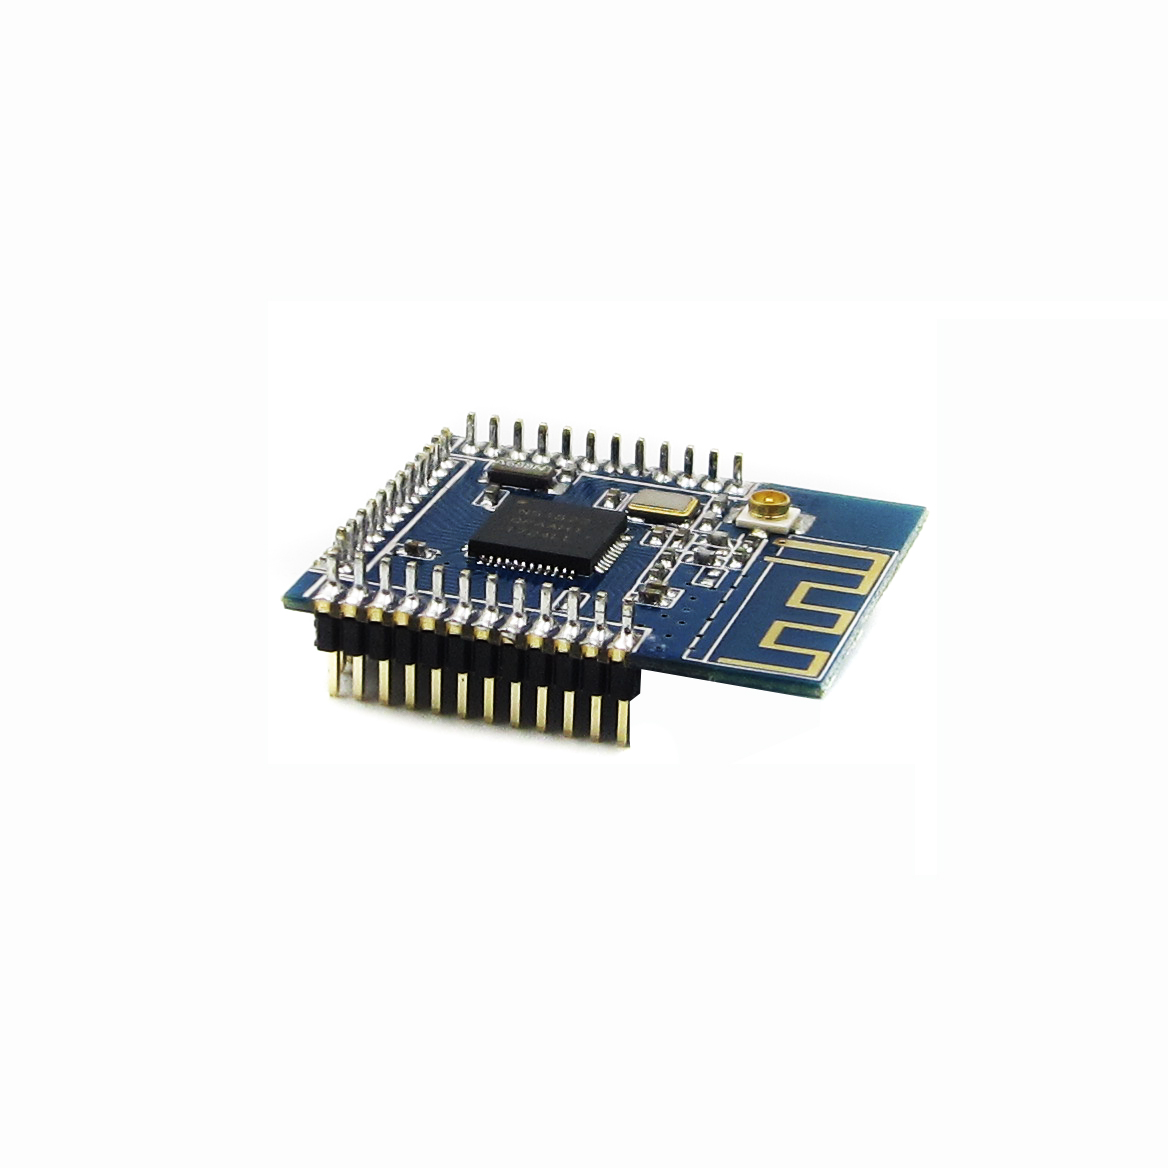 2.4GHz YJ-14015 NRF51822 Bluetooth Networking 3.3V// 1.8-3.6V Blue// Black US